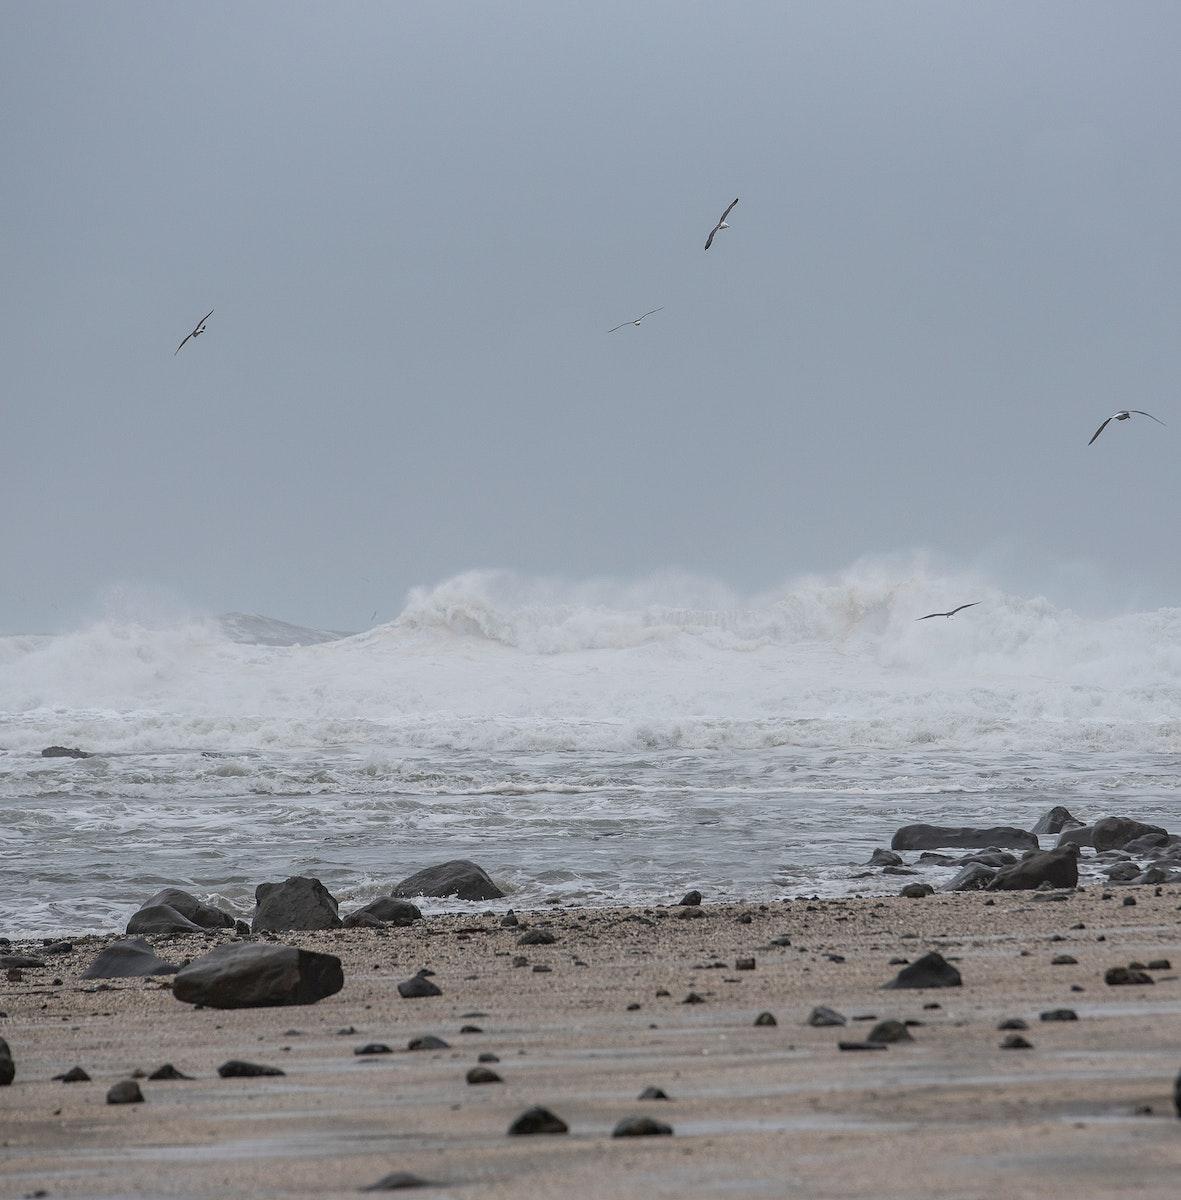 Seagulls gliding over the beach